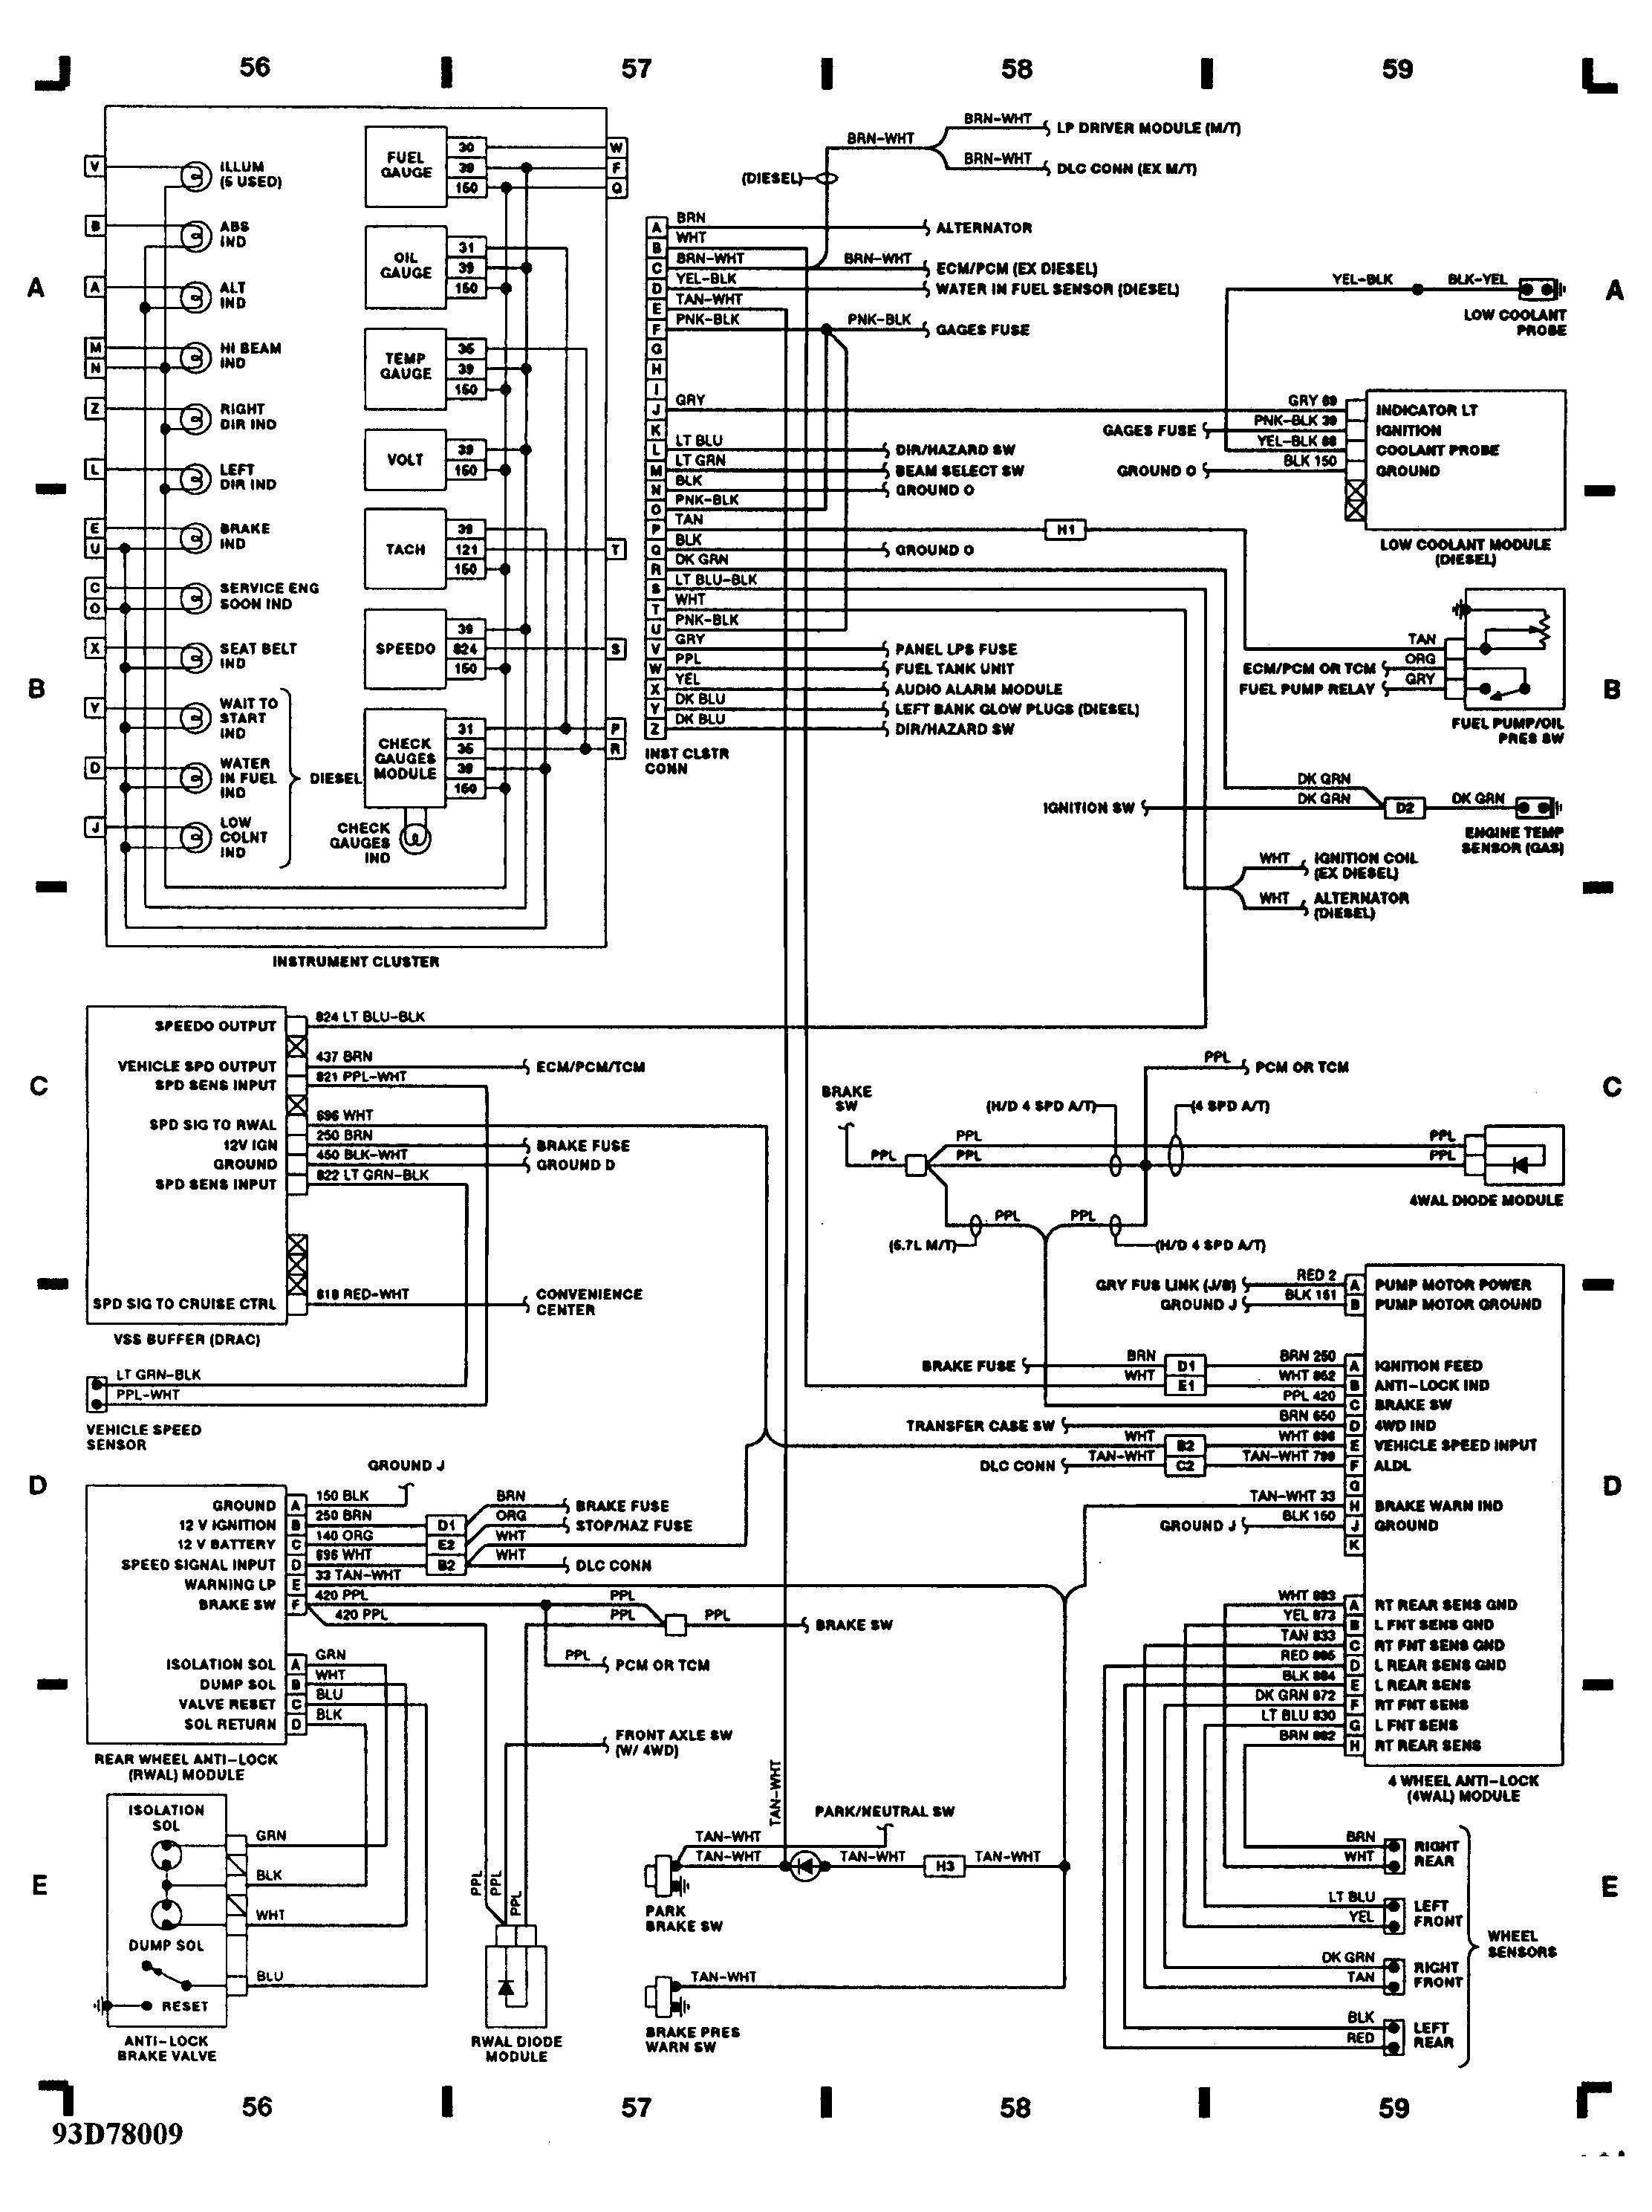 Bargman Breakaway Switch Instructions Jvc Wire Diagram Stereo Of Bargman Breakaway Switch Instructions